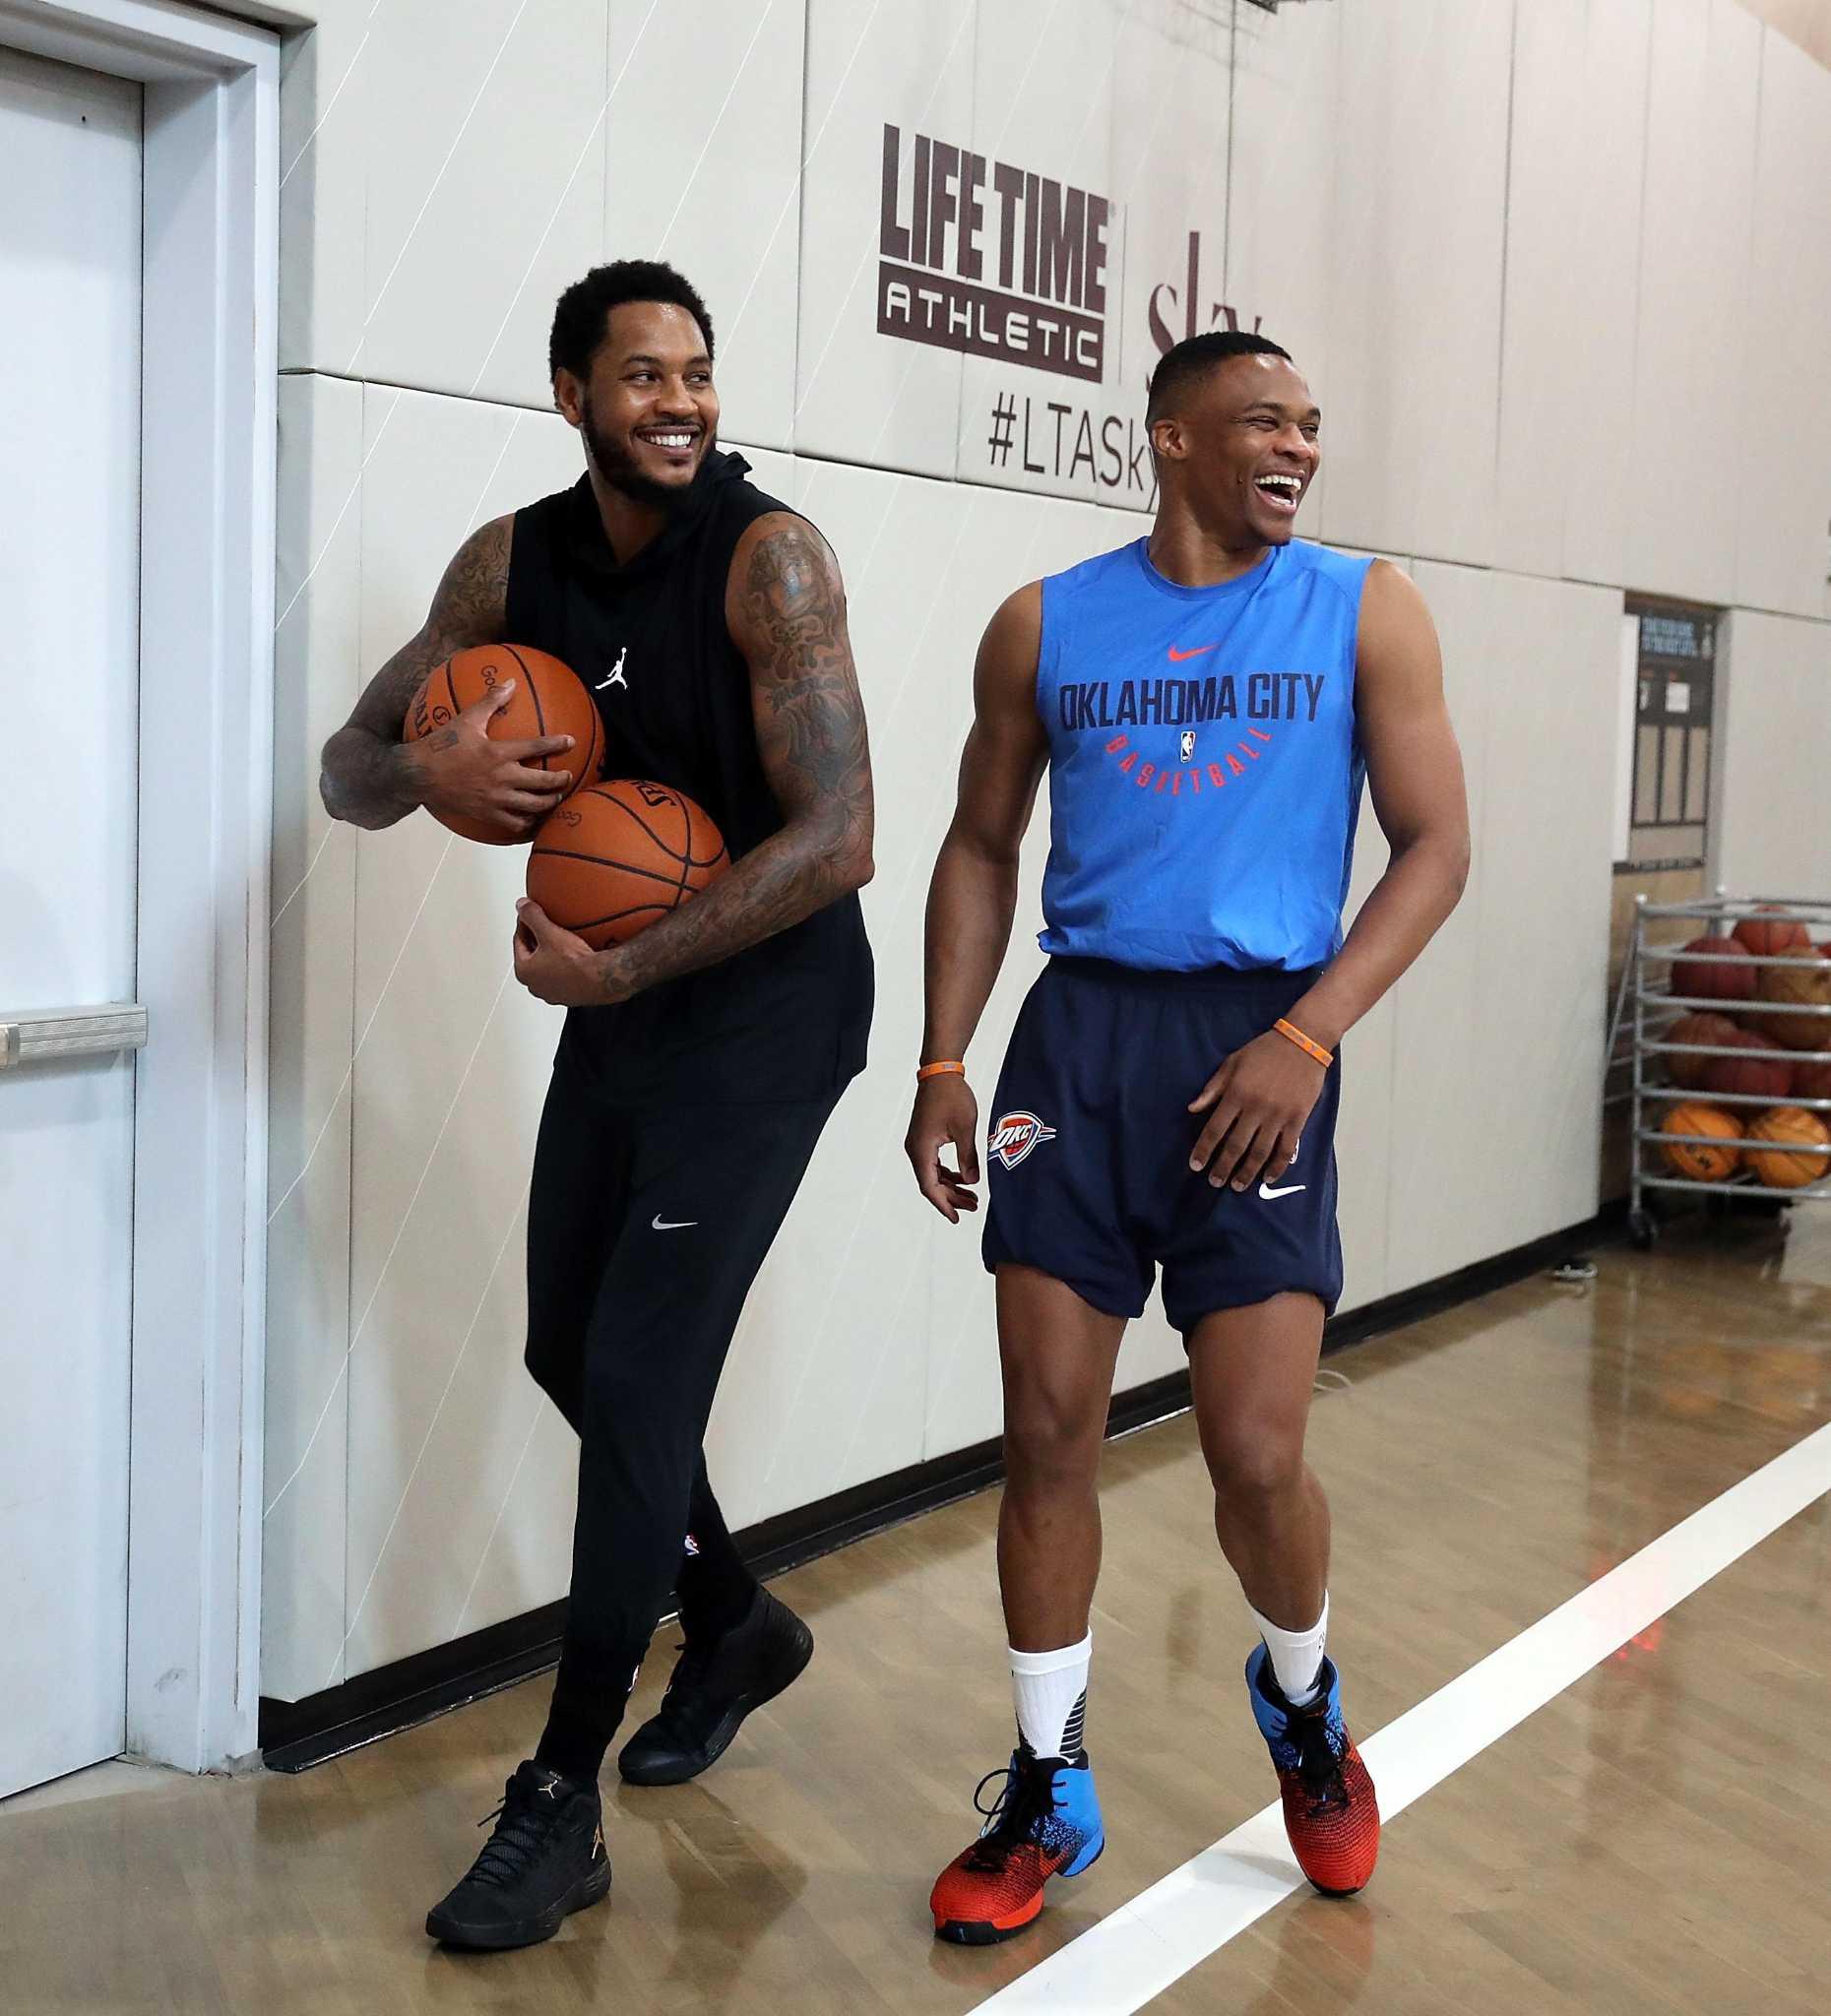 3e0b36b6c Knicks agree to trade Carmelo Anthony to Thunder - SFGate